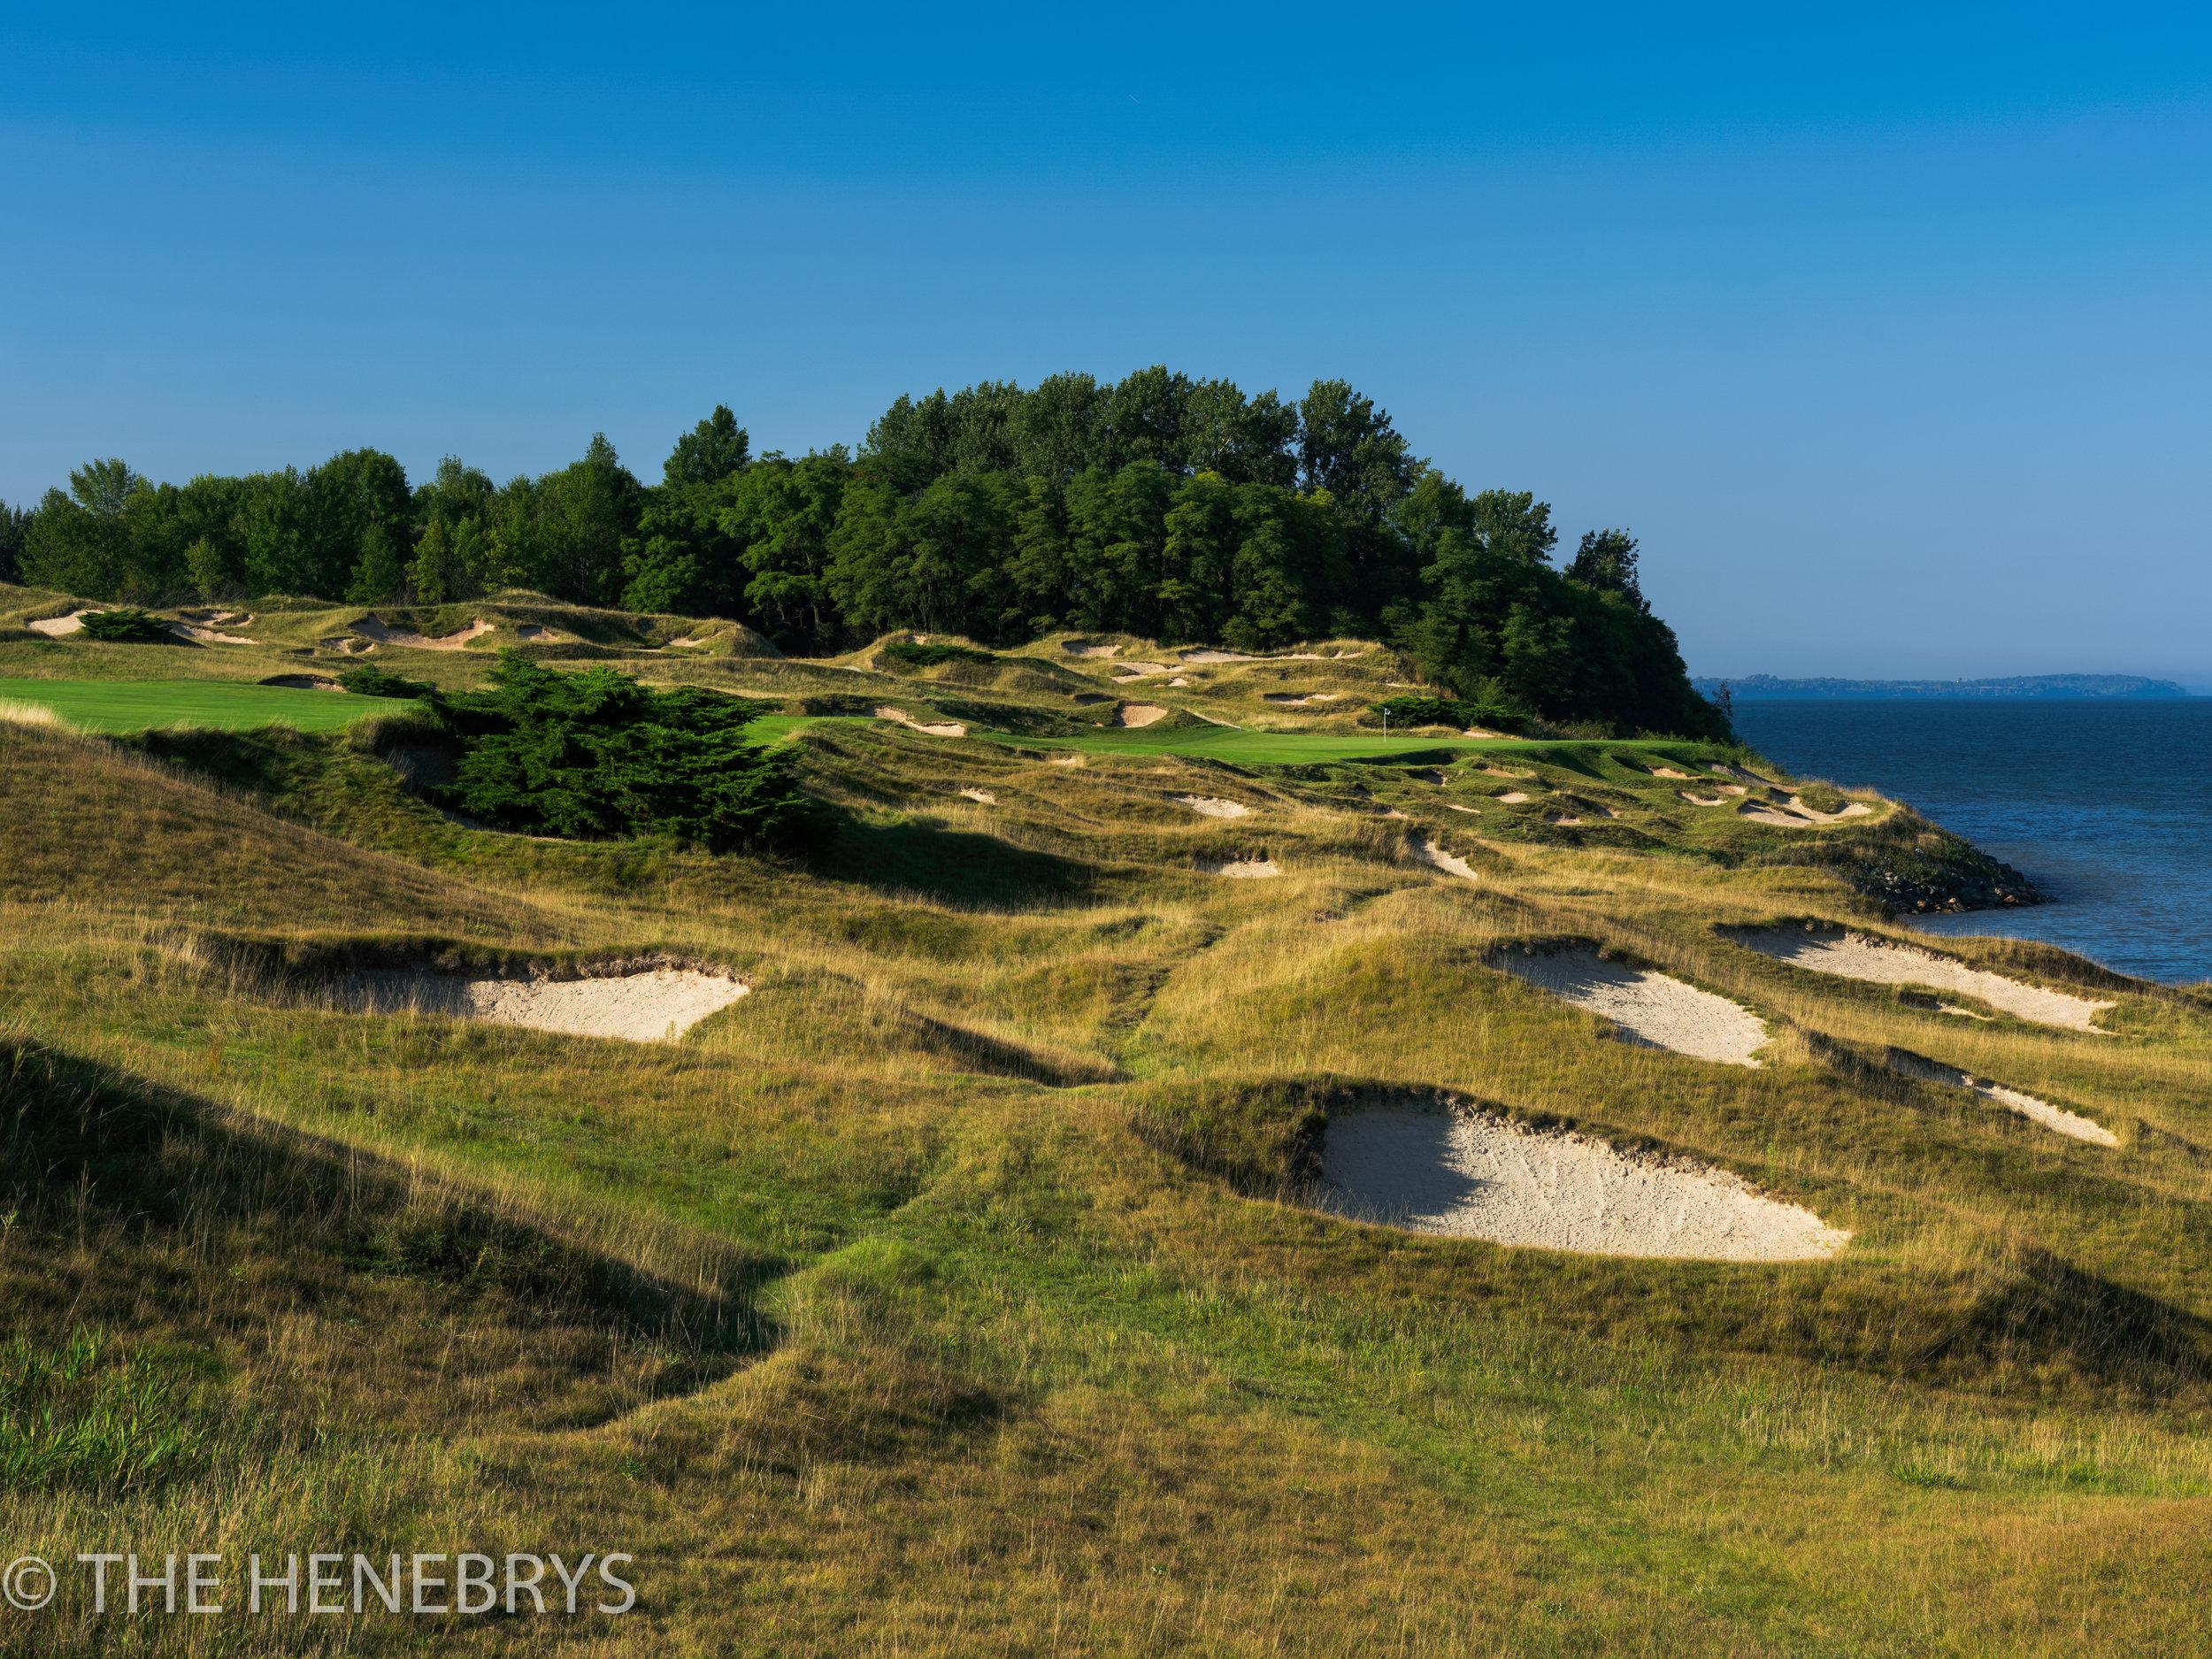 Whistling Straits, Straits Course #14, Kohler, Wisconsin